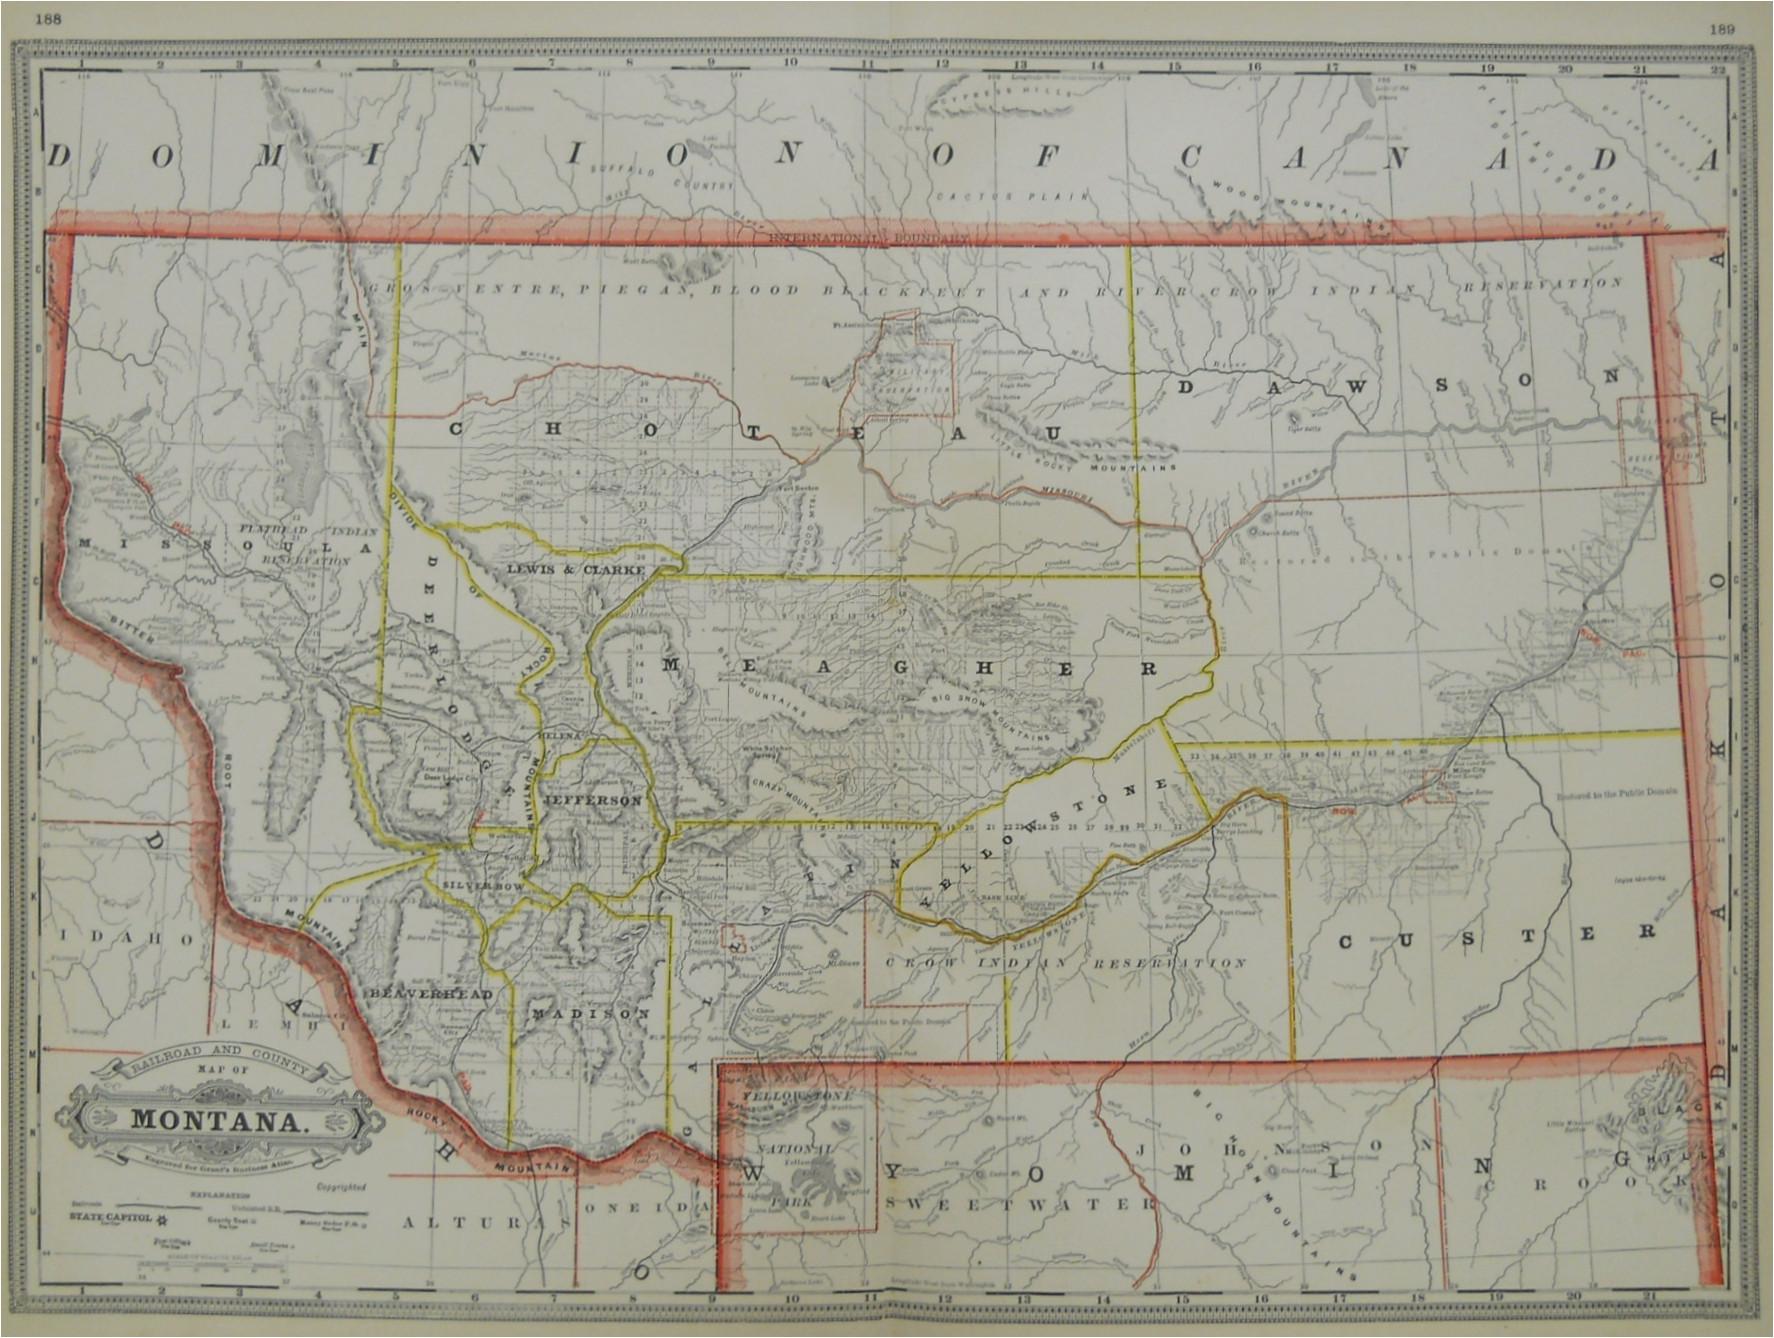 Minnesota Railroad Map Grant S Railroad and County Map Of Montana 1886 Philadelphia